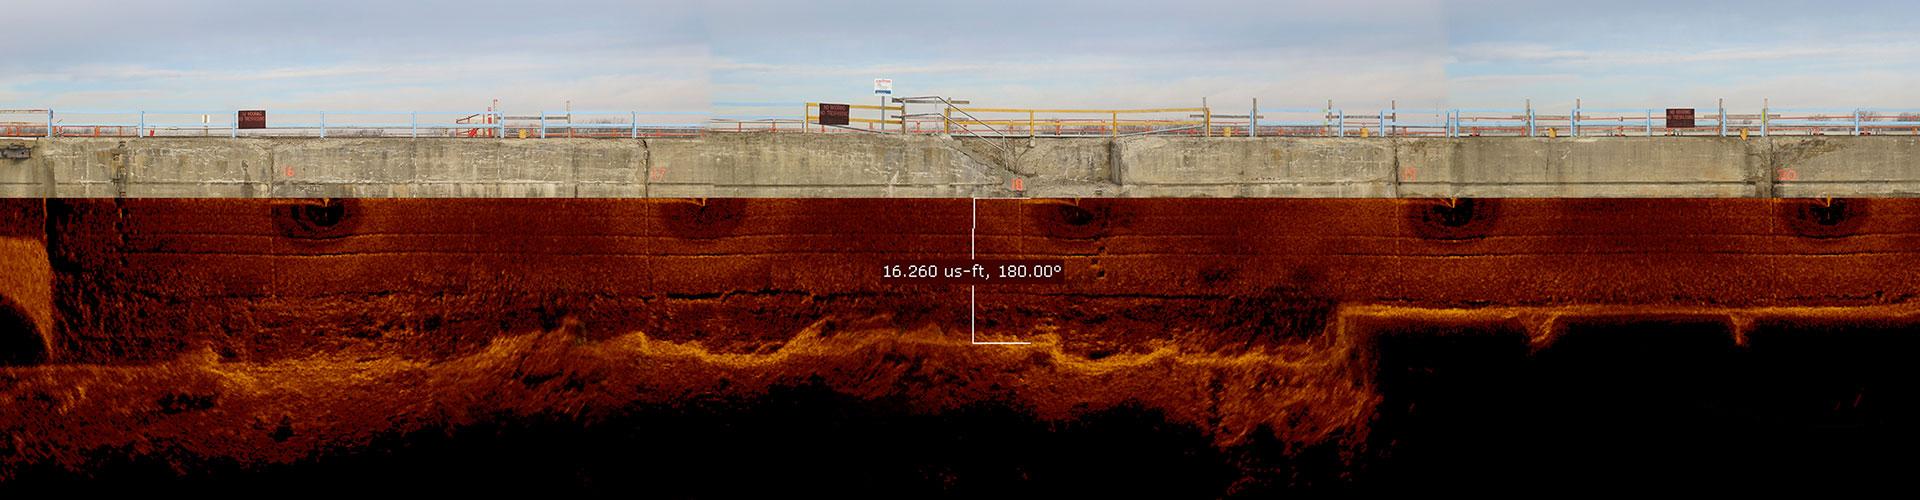 sector scan, underwater acoustic imaging, underwater imaging, 360 degree acoustic imaging, dam inspections